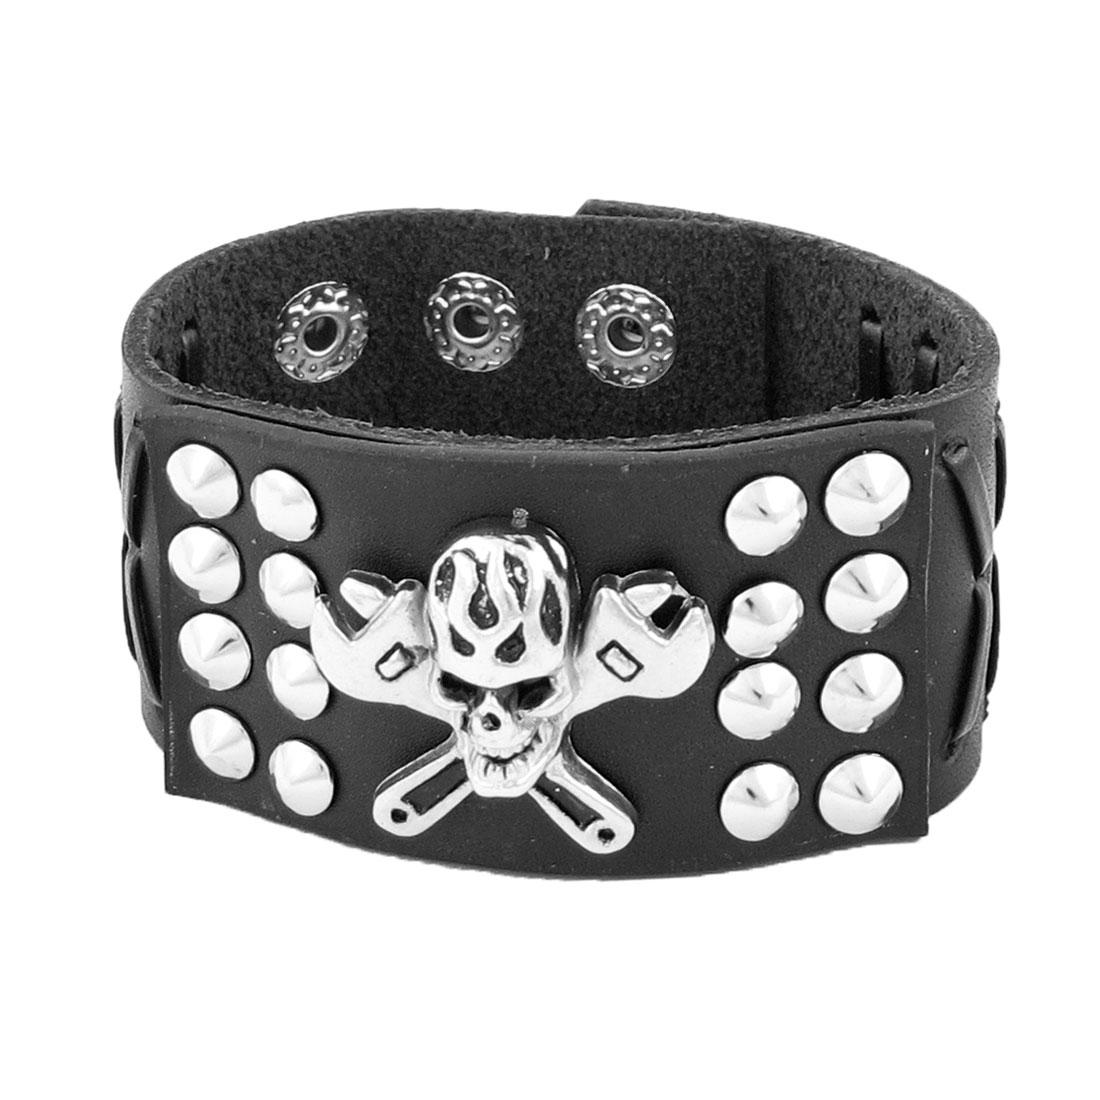 Black Punk Rivet Skull Ornament Faux Leather Bangle Bracelet Chain